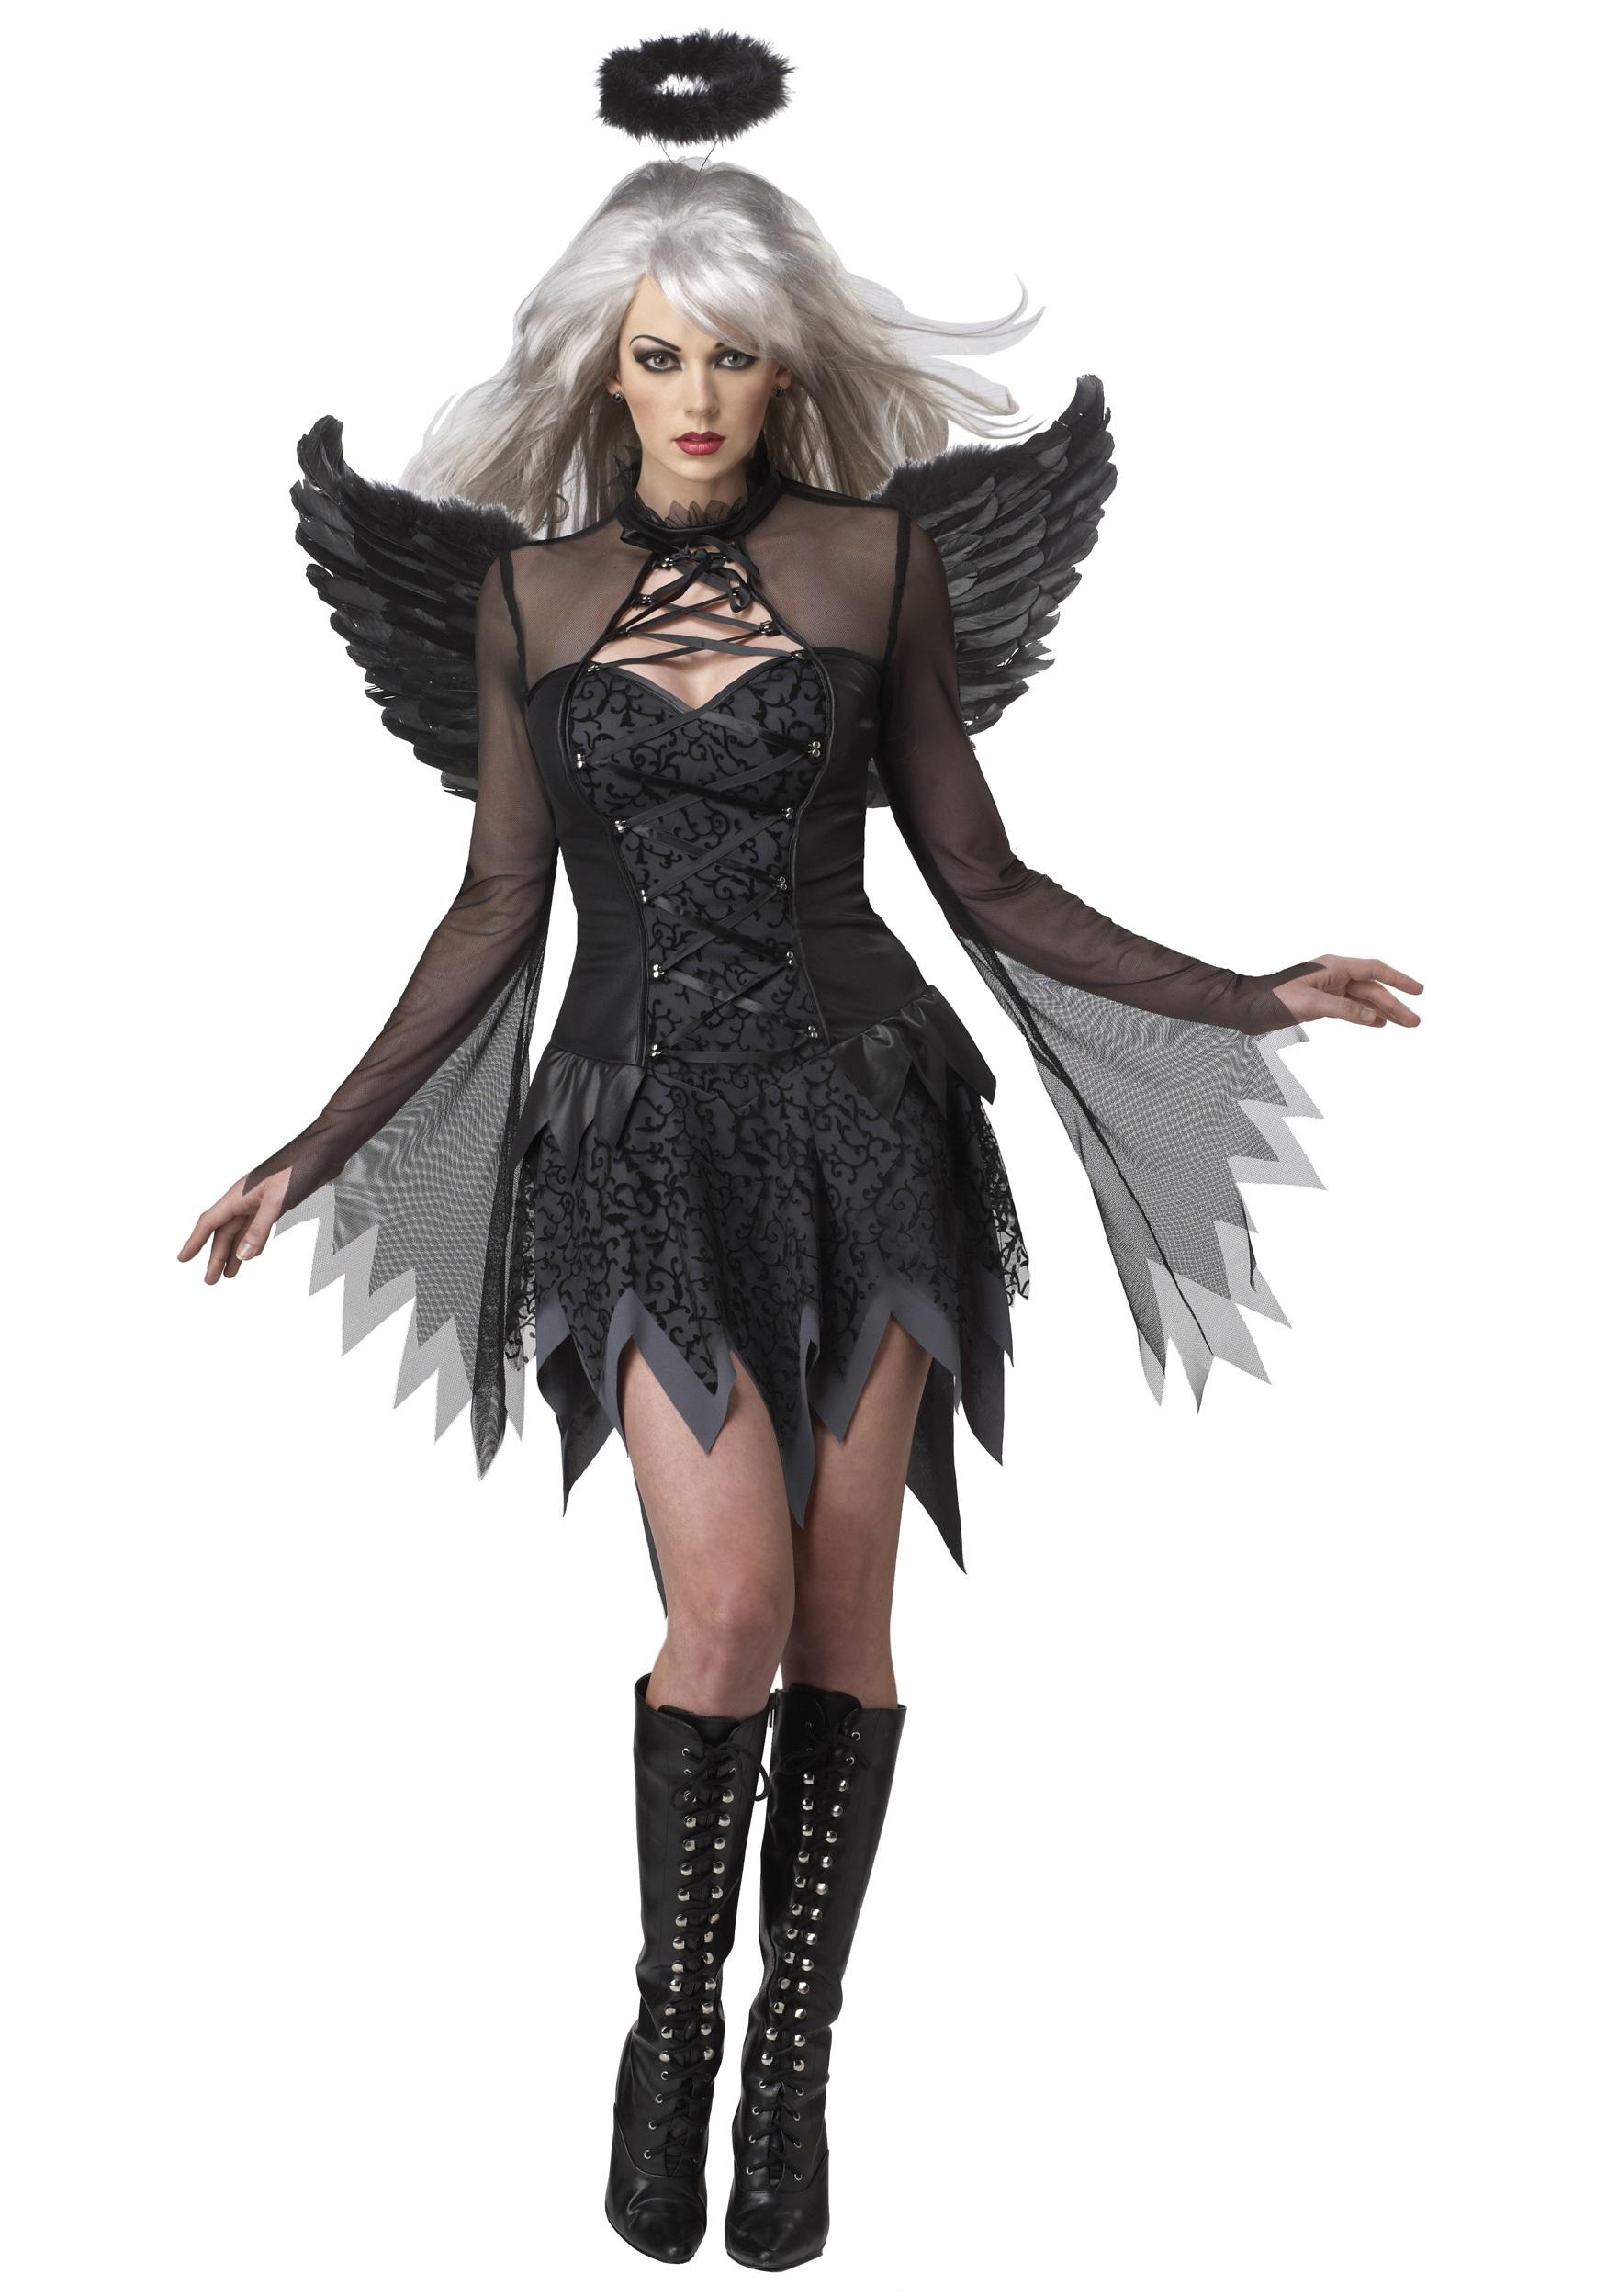 Sexy Fallen Angel Costume  sc 1 st  Halloween Costumes UK & Scary Adult Costumes - Adult Scary Halloween Costume Ideas